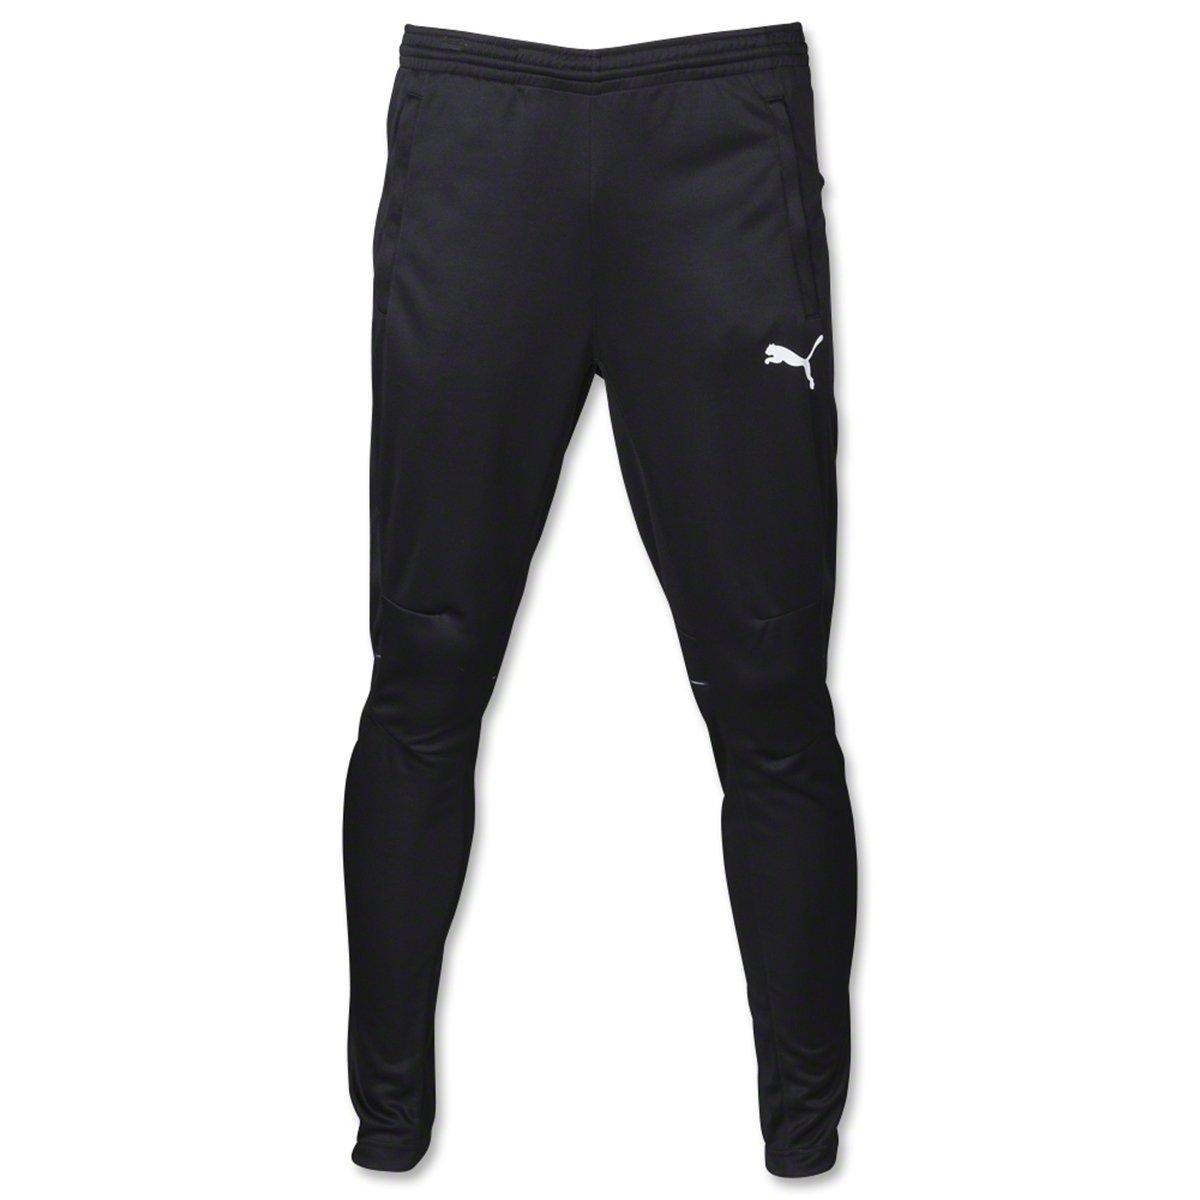 PUMA Men's Training Pant, Black/White, YM